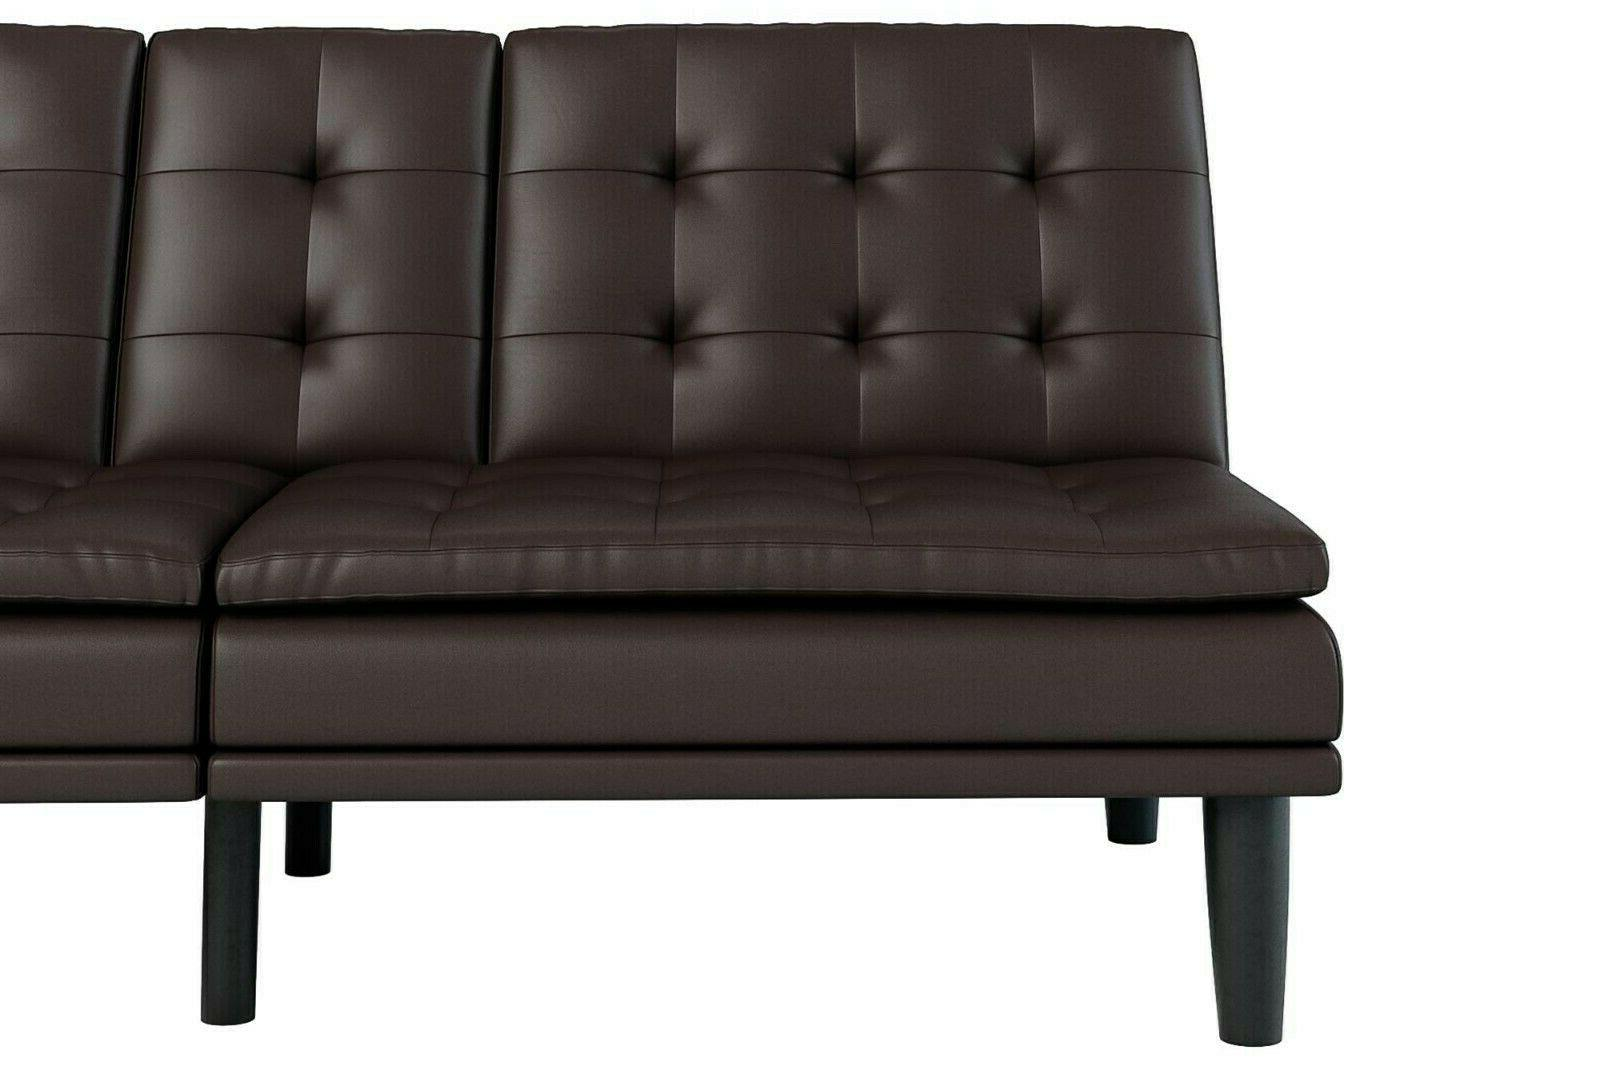 Sofa Bed Convertible Futon Modern